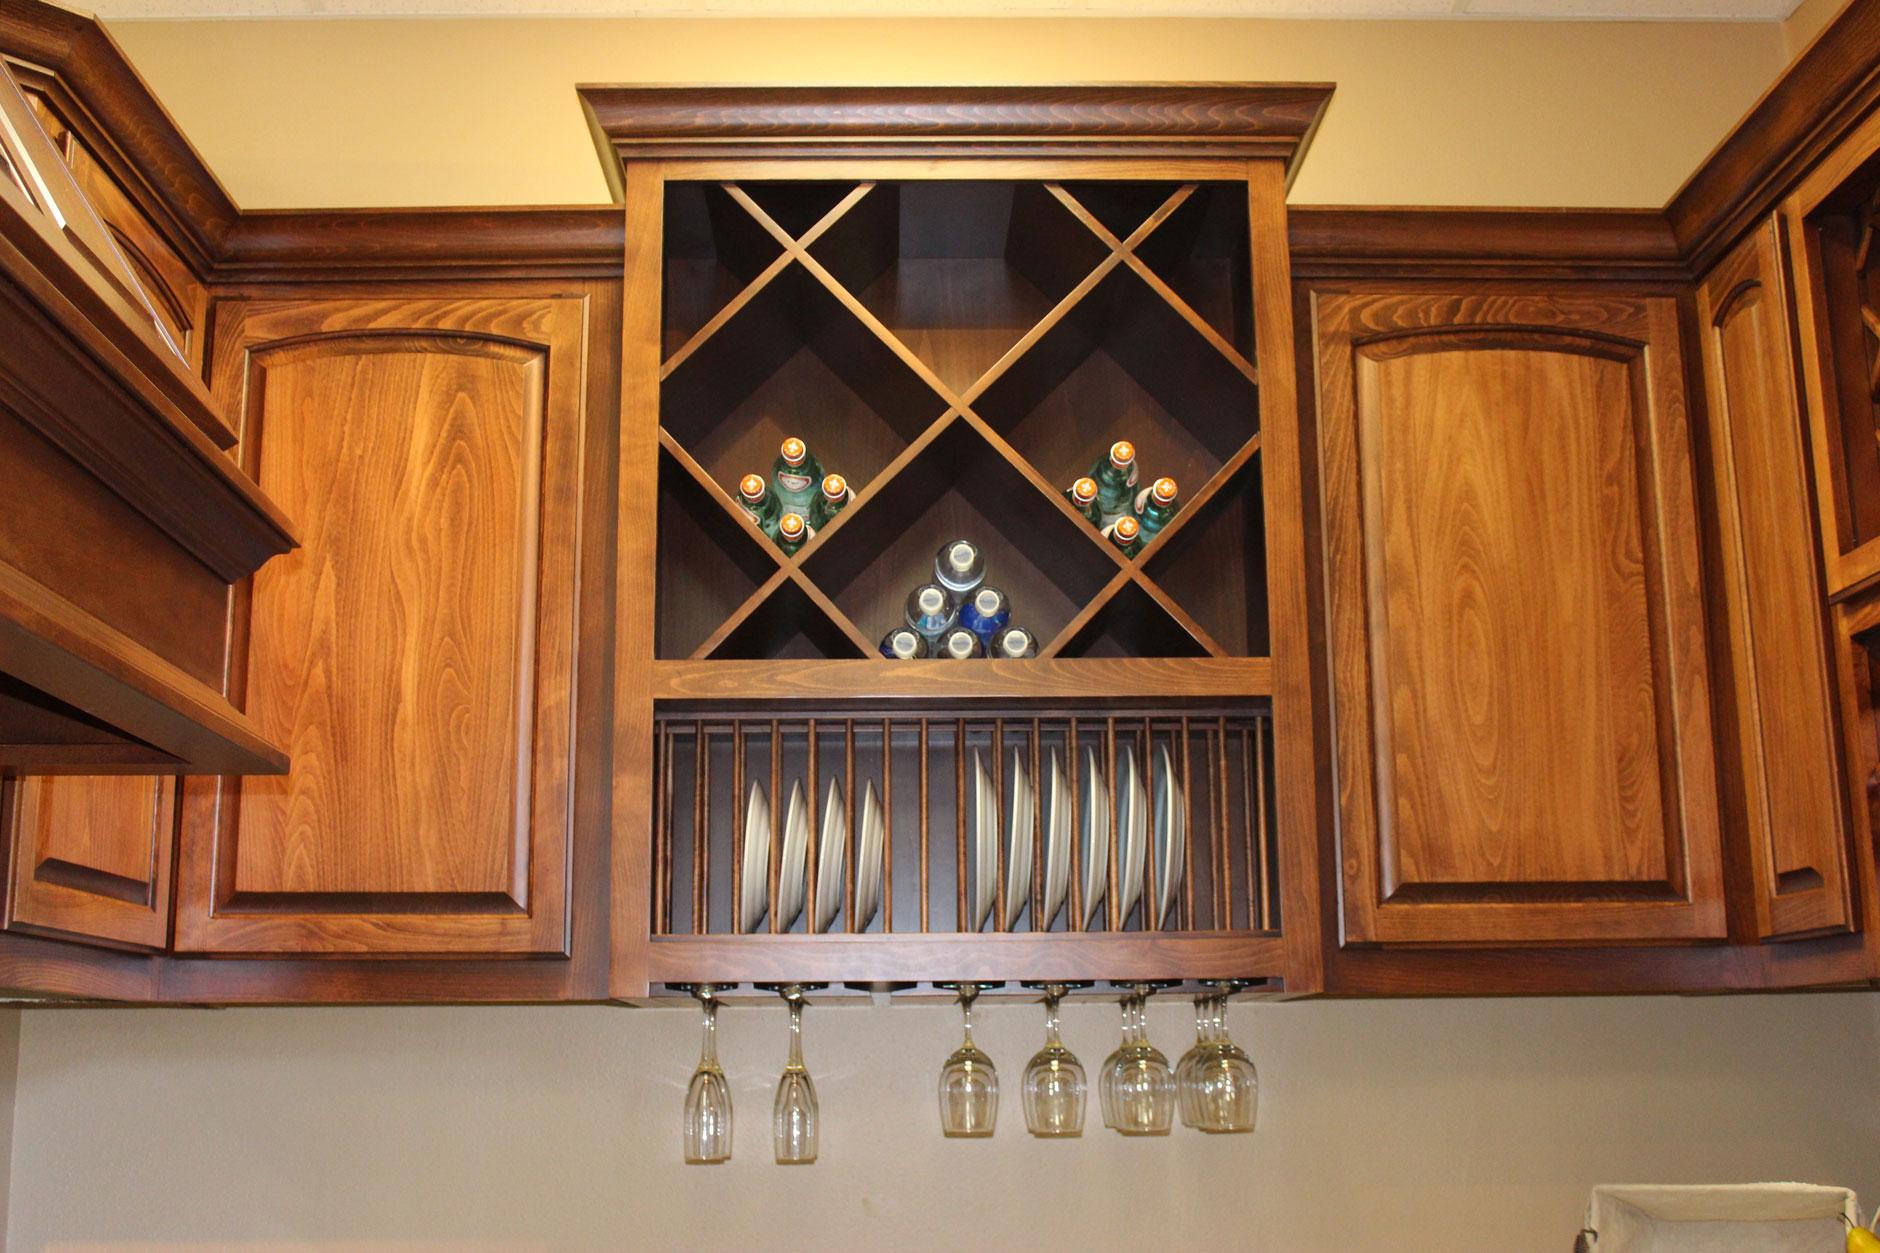 Custom wood plate racks, stemware racks and big x wine cubes